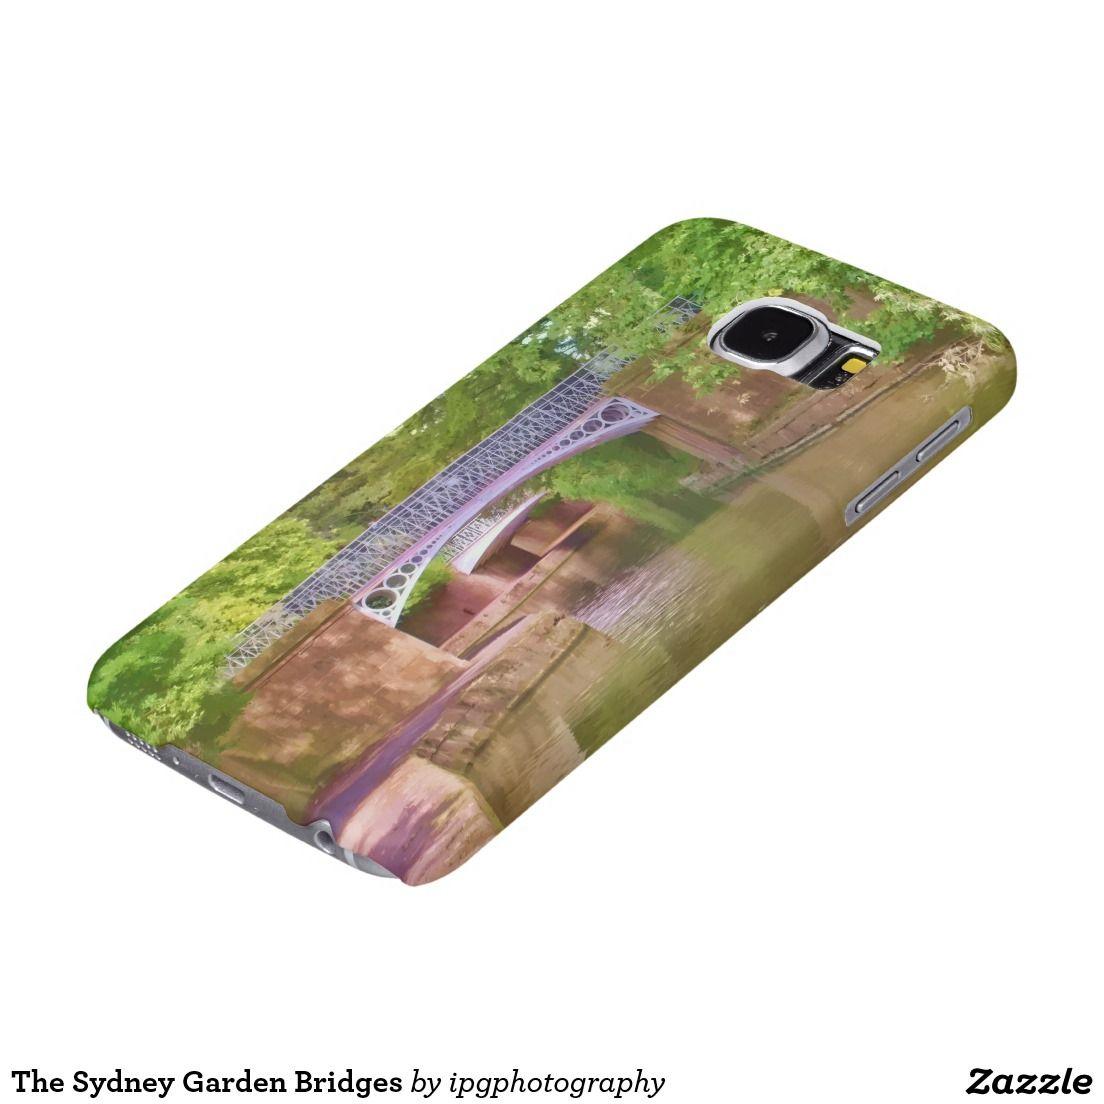 The Sydney Garden Bridges, Bath. Casemate case for iphone and Samsung Galaxy series